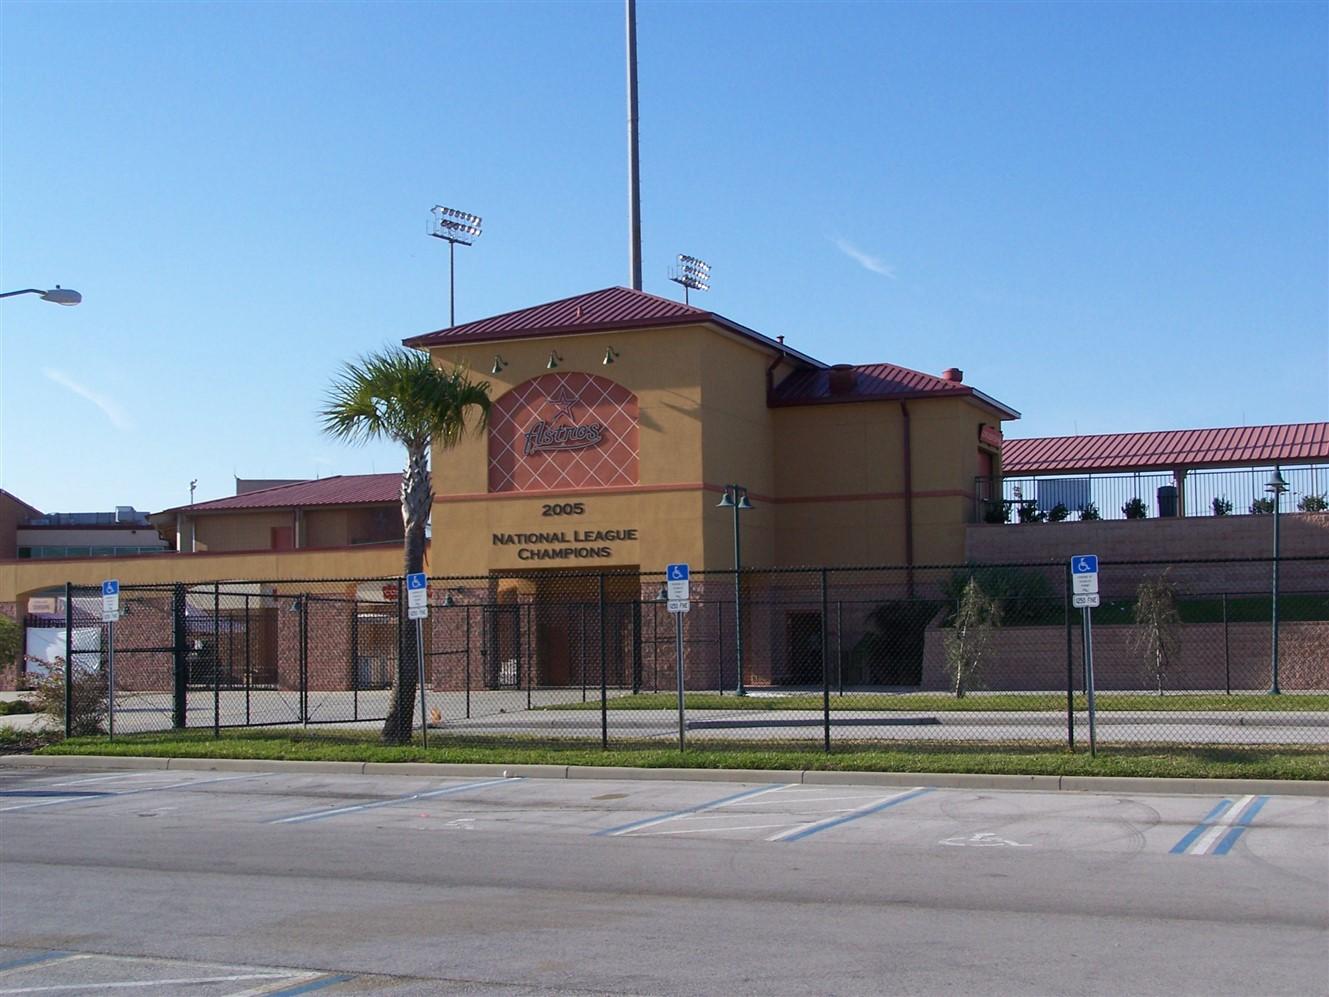 2007 03 06 Houston Astros Spring Training Site Kissimmee Florida 10.jpg